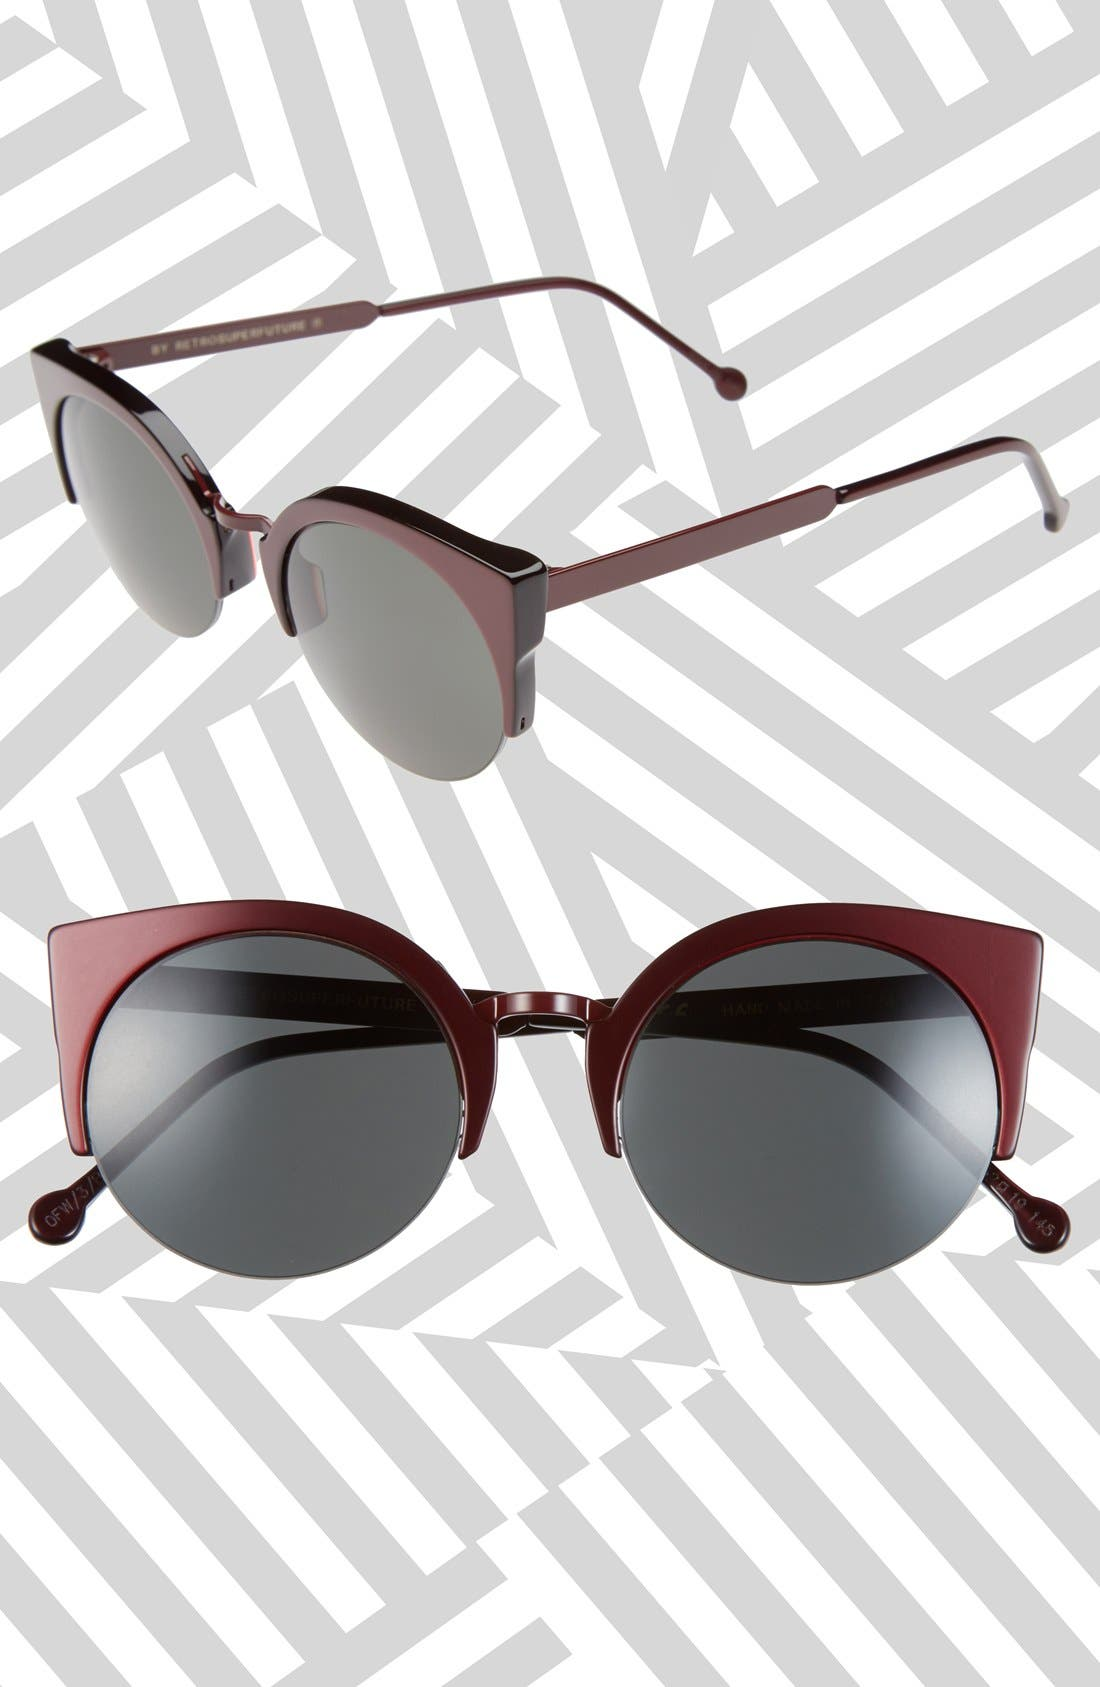 Main Image - SUPER by RETROSUPERFUTURE® 'Lucia Francis Femmena' 52mm Sunglasses